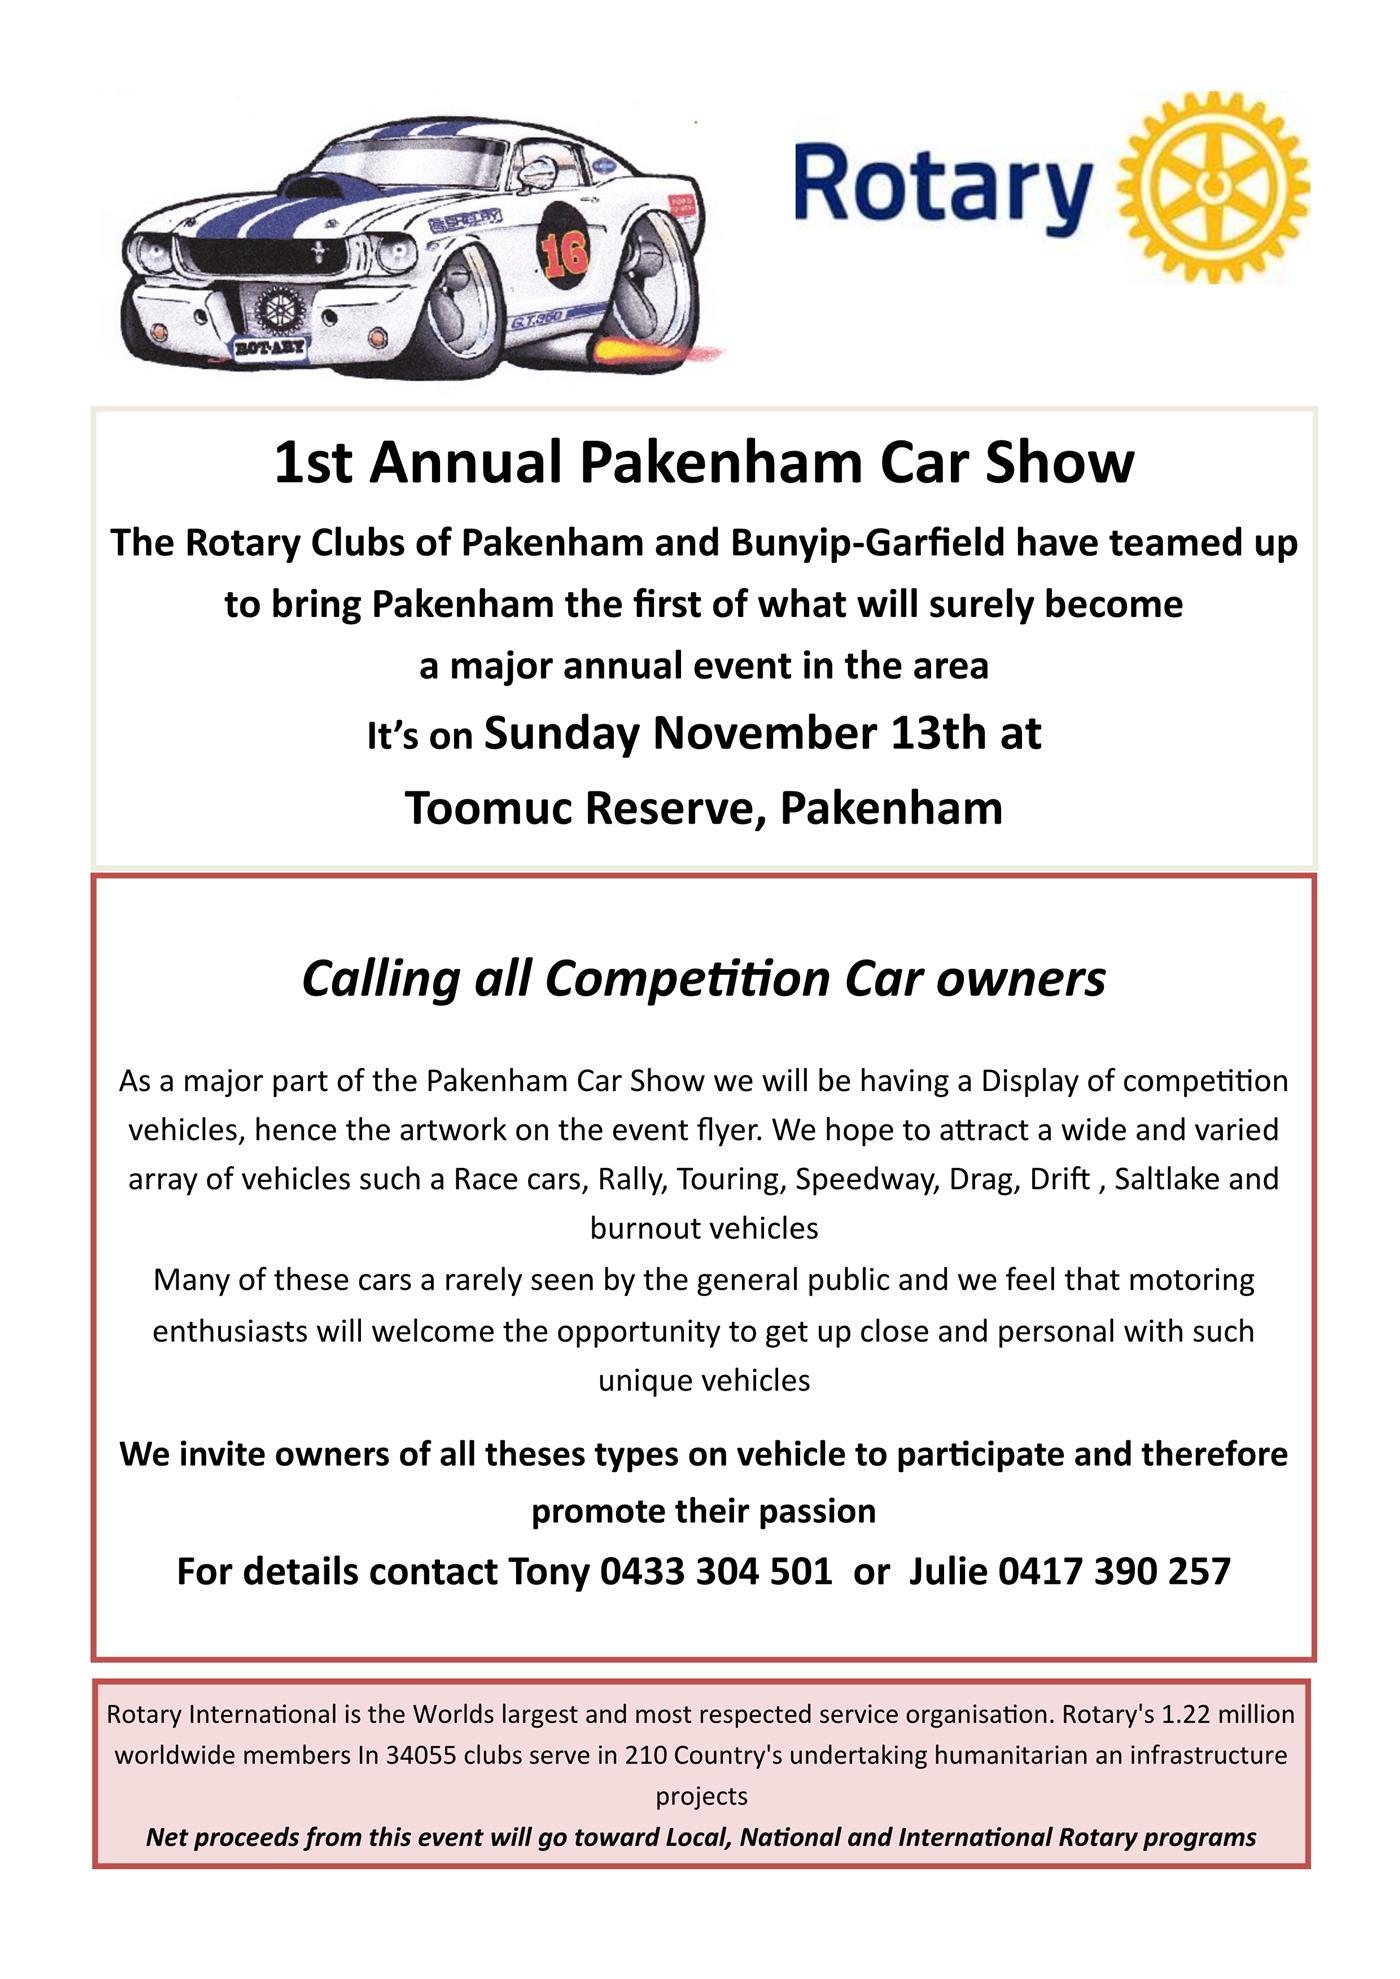 Competition Cars Welcome At Pakenham Car Show Rotary Club Of Pakenham - Major car shows